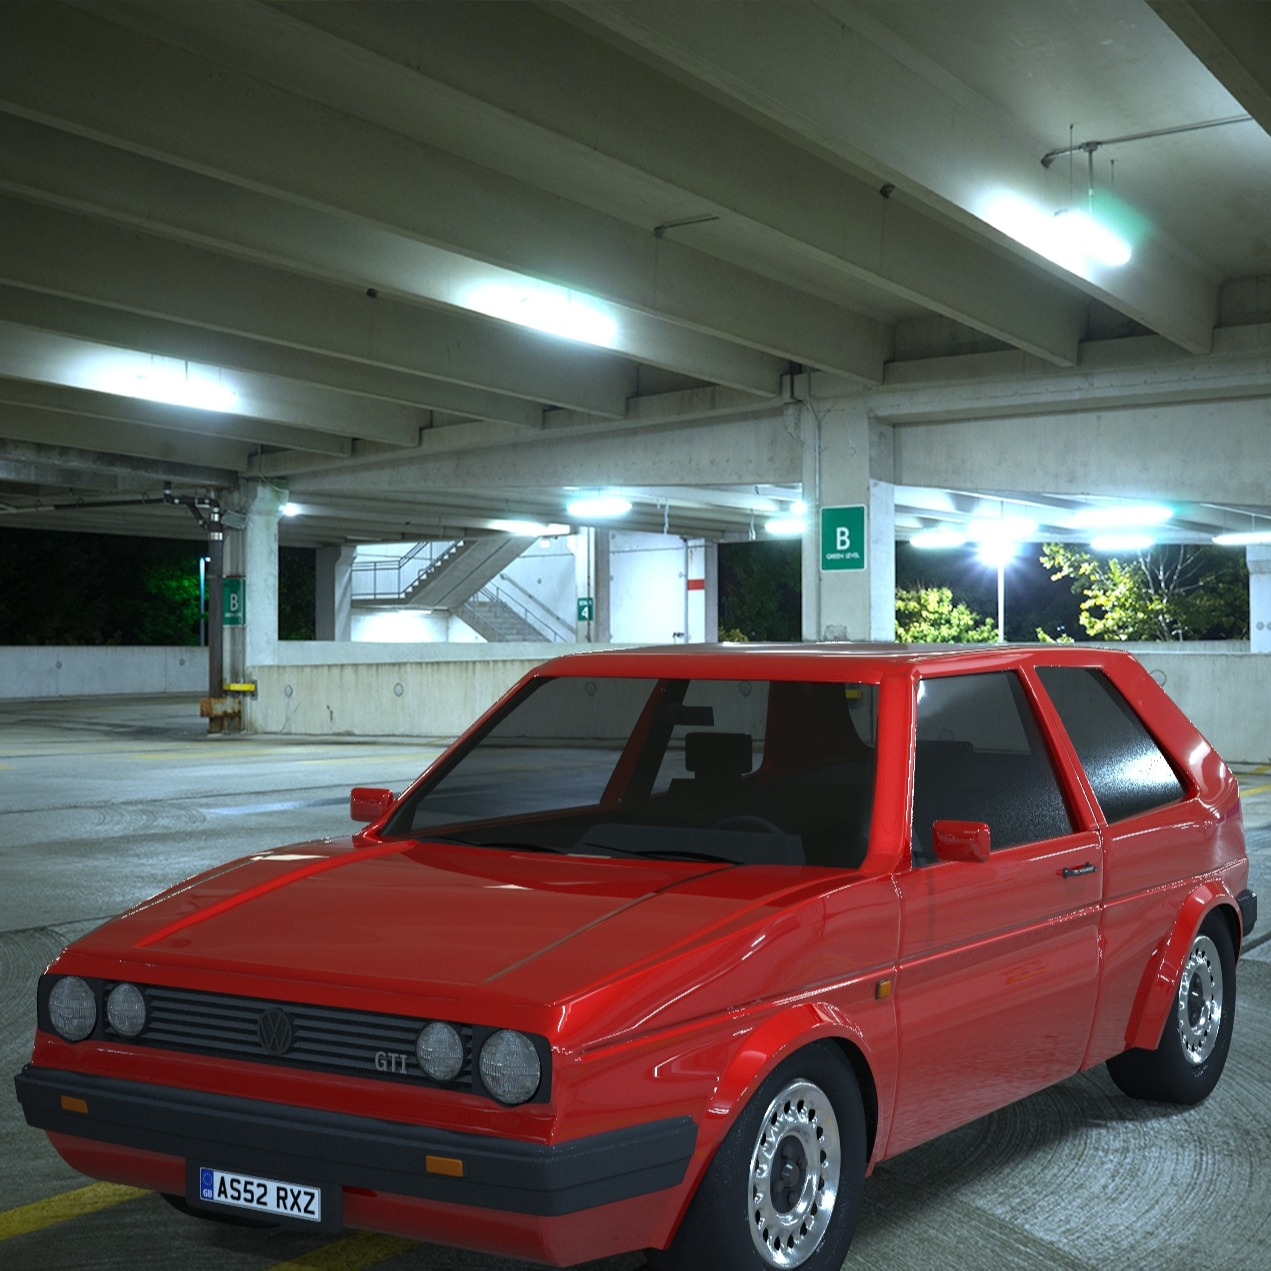 Volkswagen Golf (Mk2)